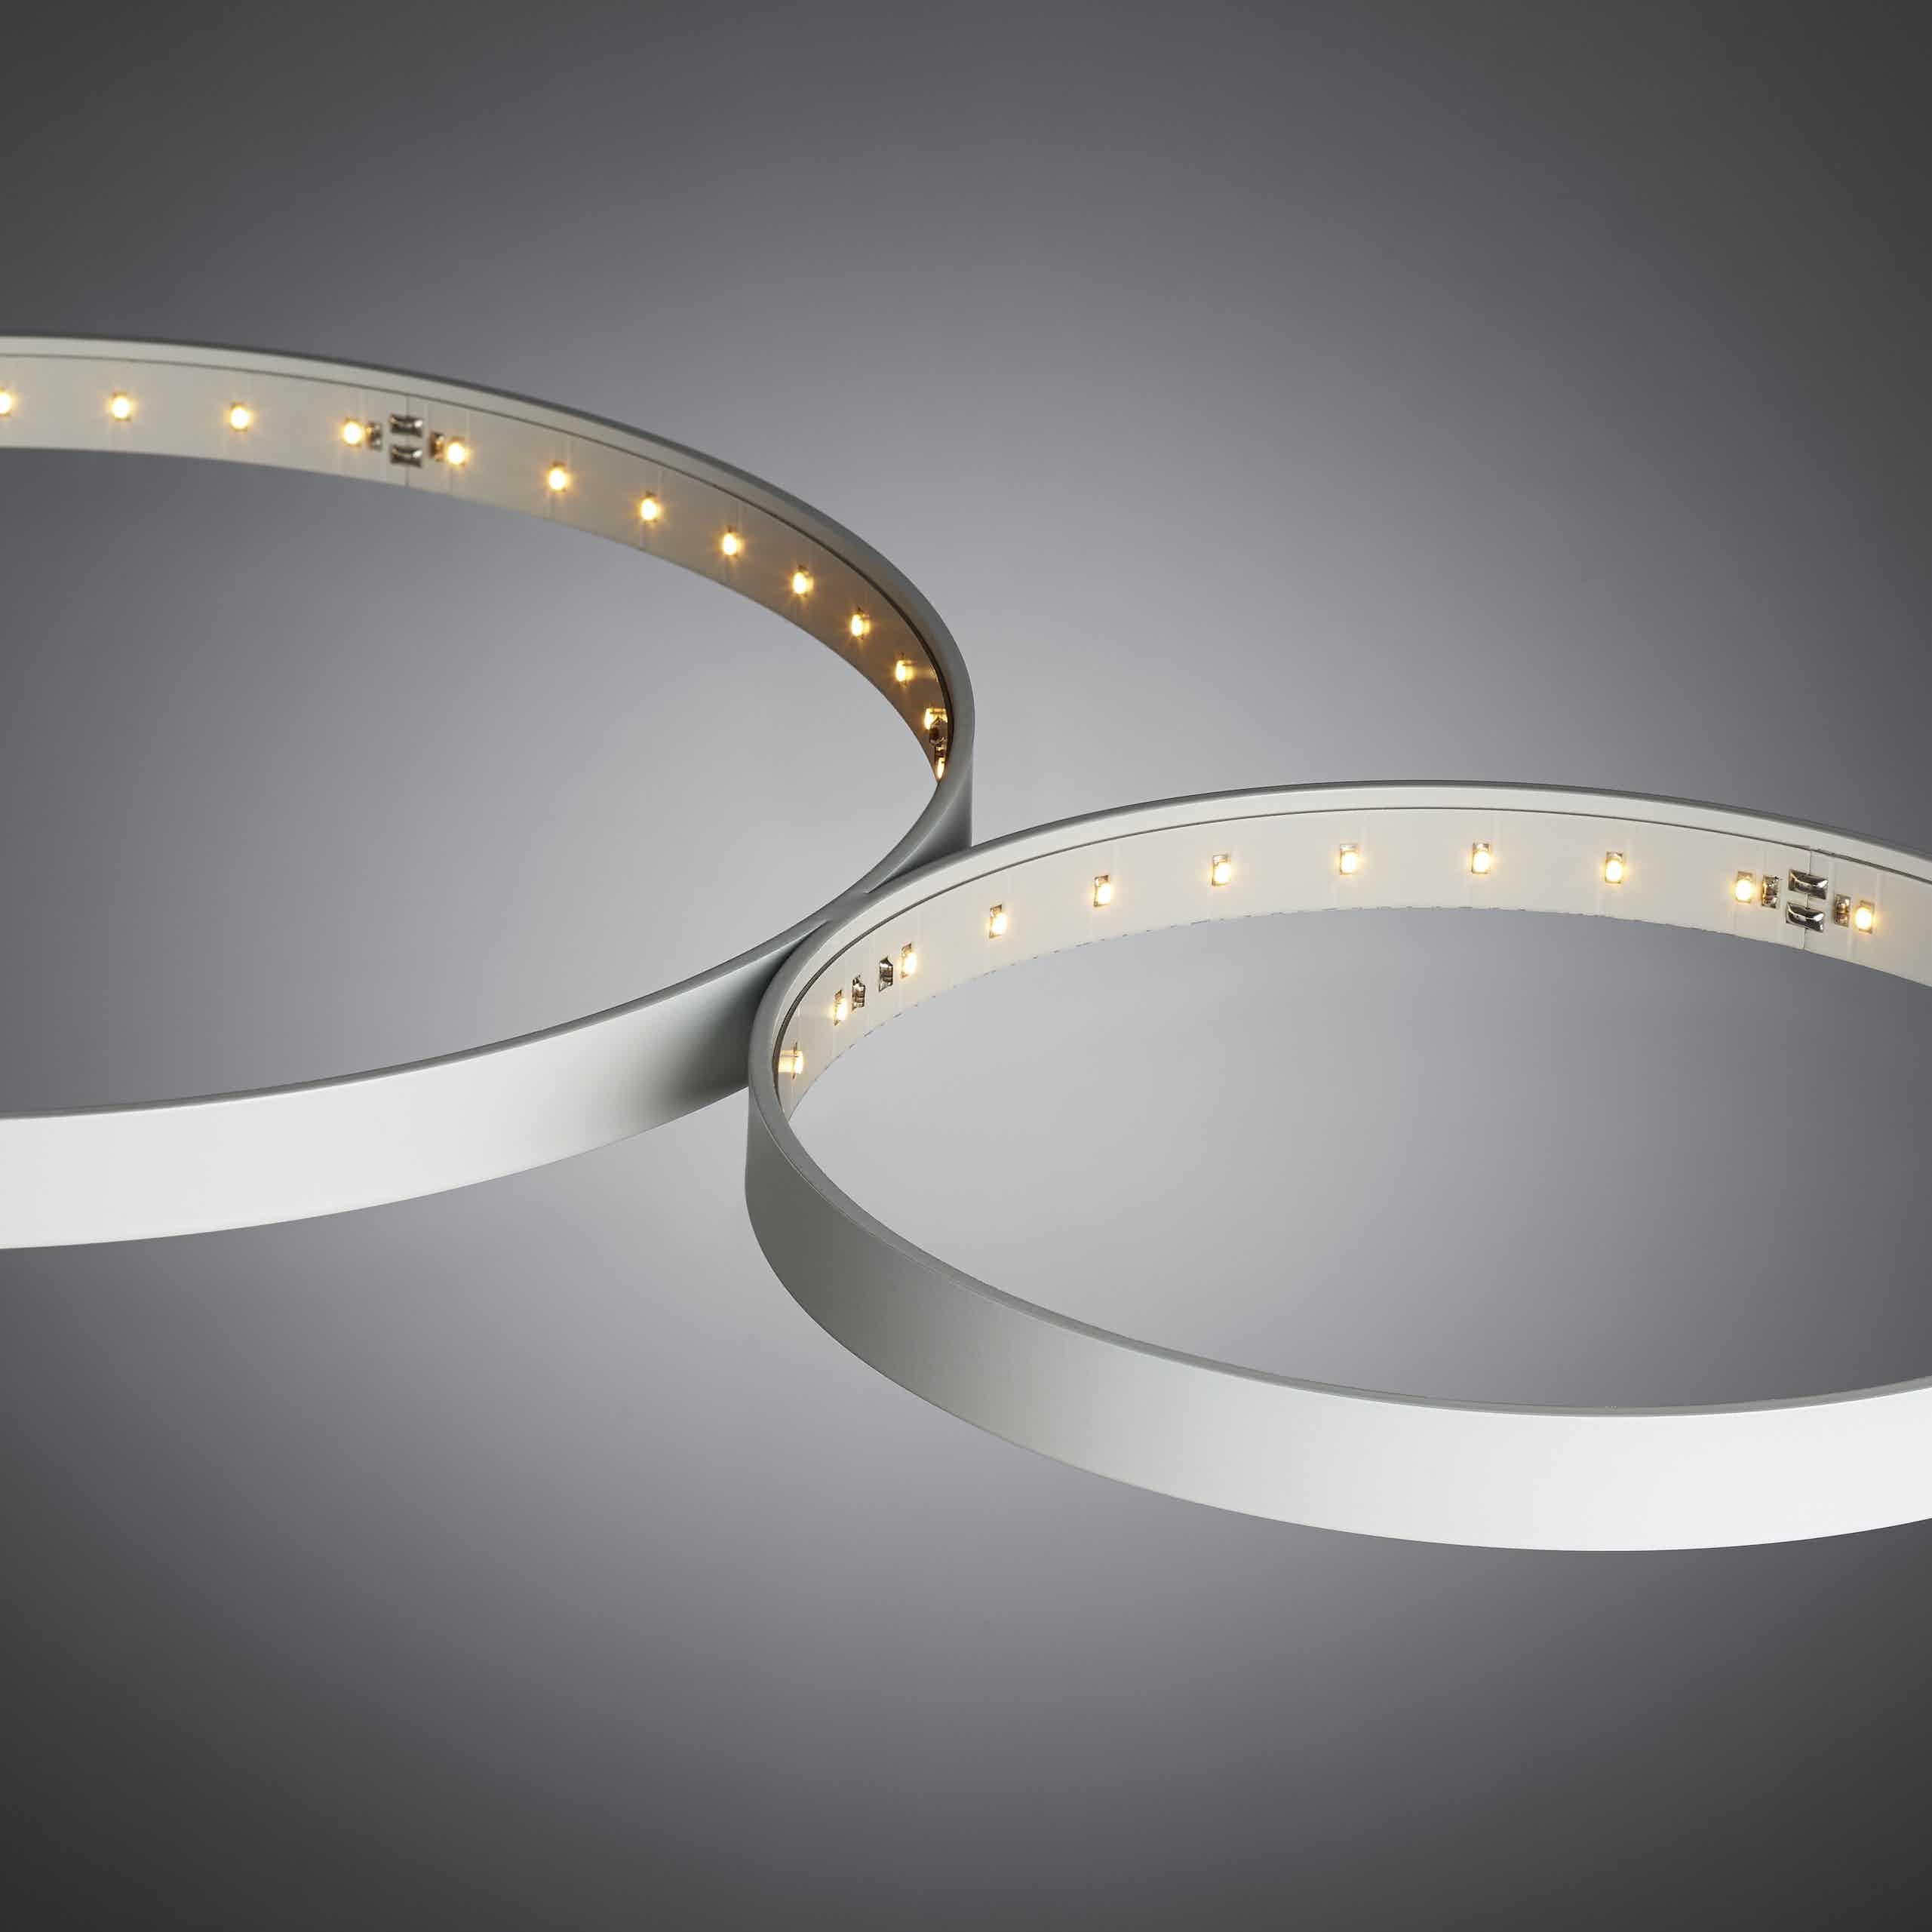 Le-deun-luminaires-super-8-hanging-lamp-white-detail-haute-living